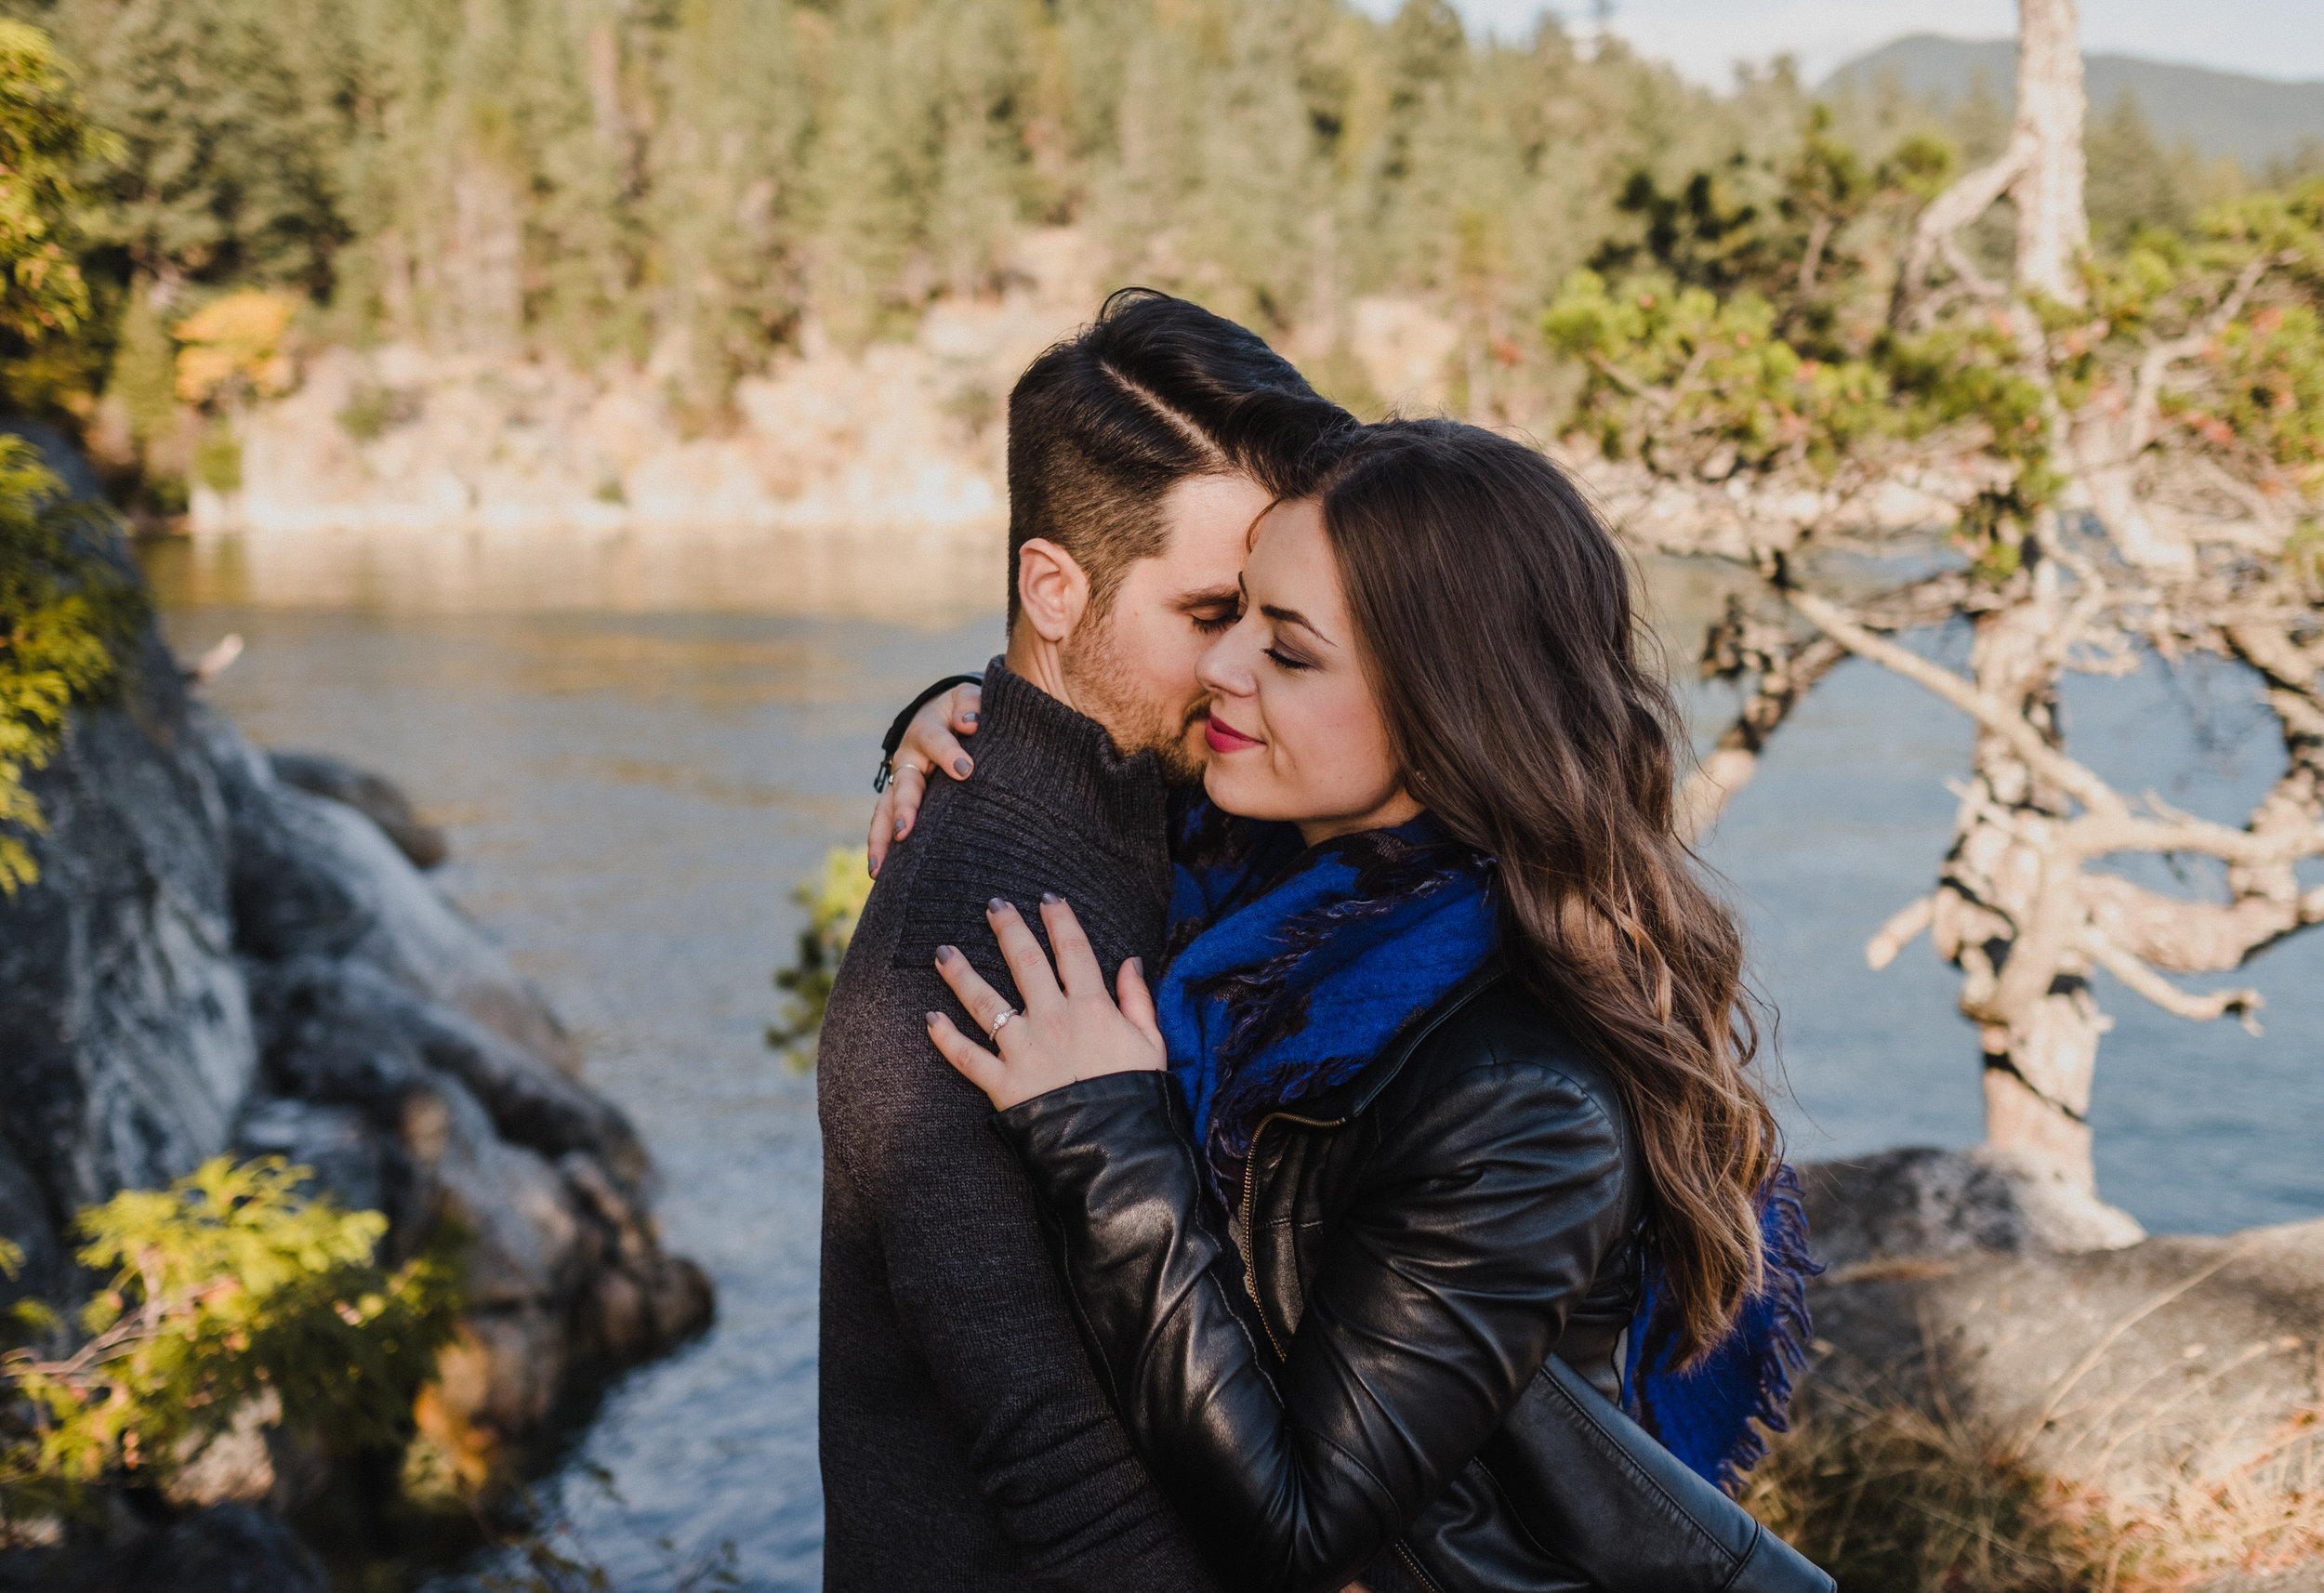 Lighthouse Park Engagement Photos - Vancouver Wedding Photographer & Videographer - Sunshine Coast Wedding Photos - Sunshine Coast Wedding Photographer - Jennifer Picard Photography - DSCF2968.jpg